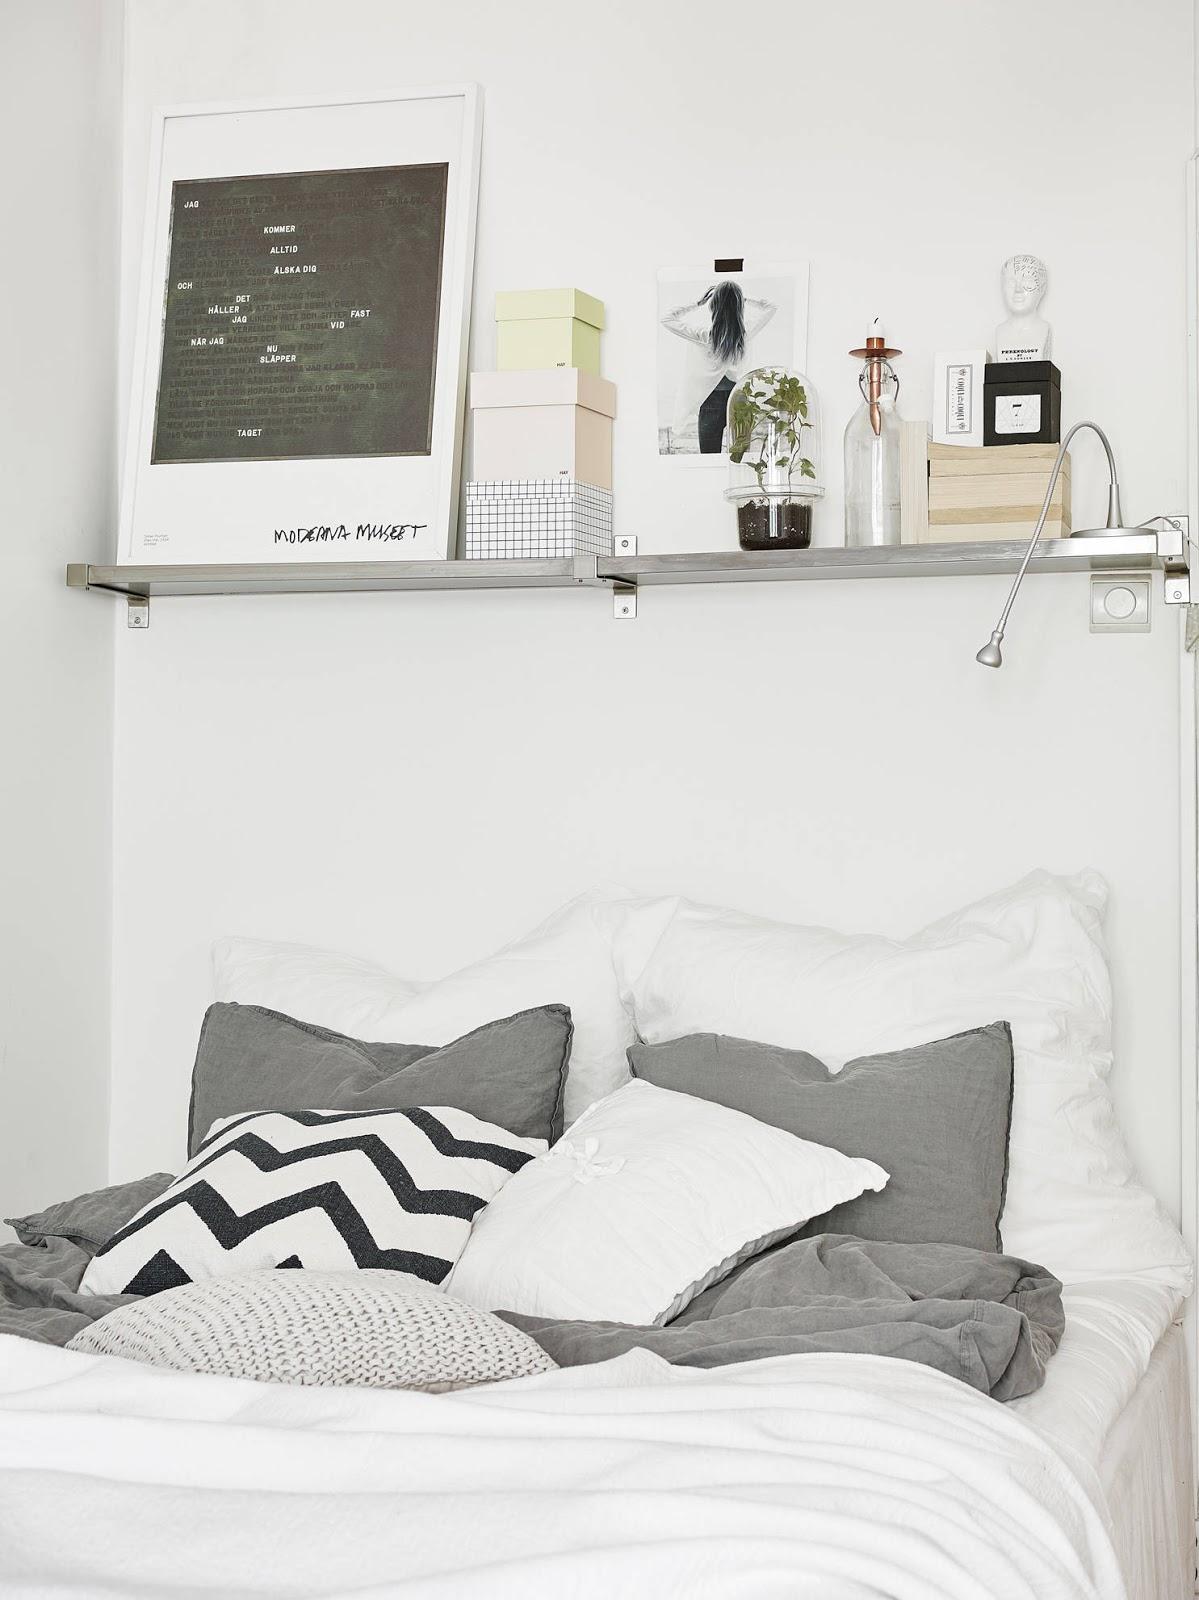 deco petit studio guiomarix. Black Bedroom Furniture Sets. Home Design Ideas